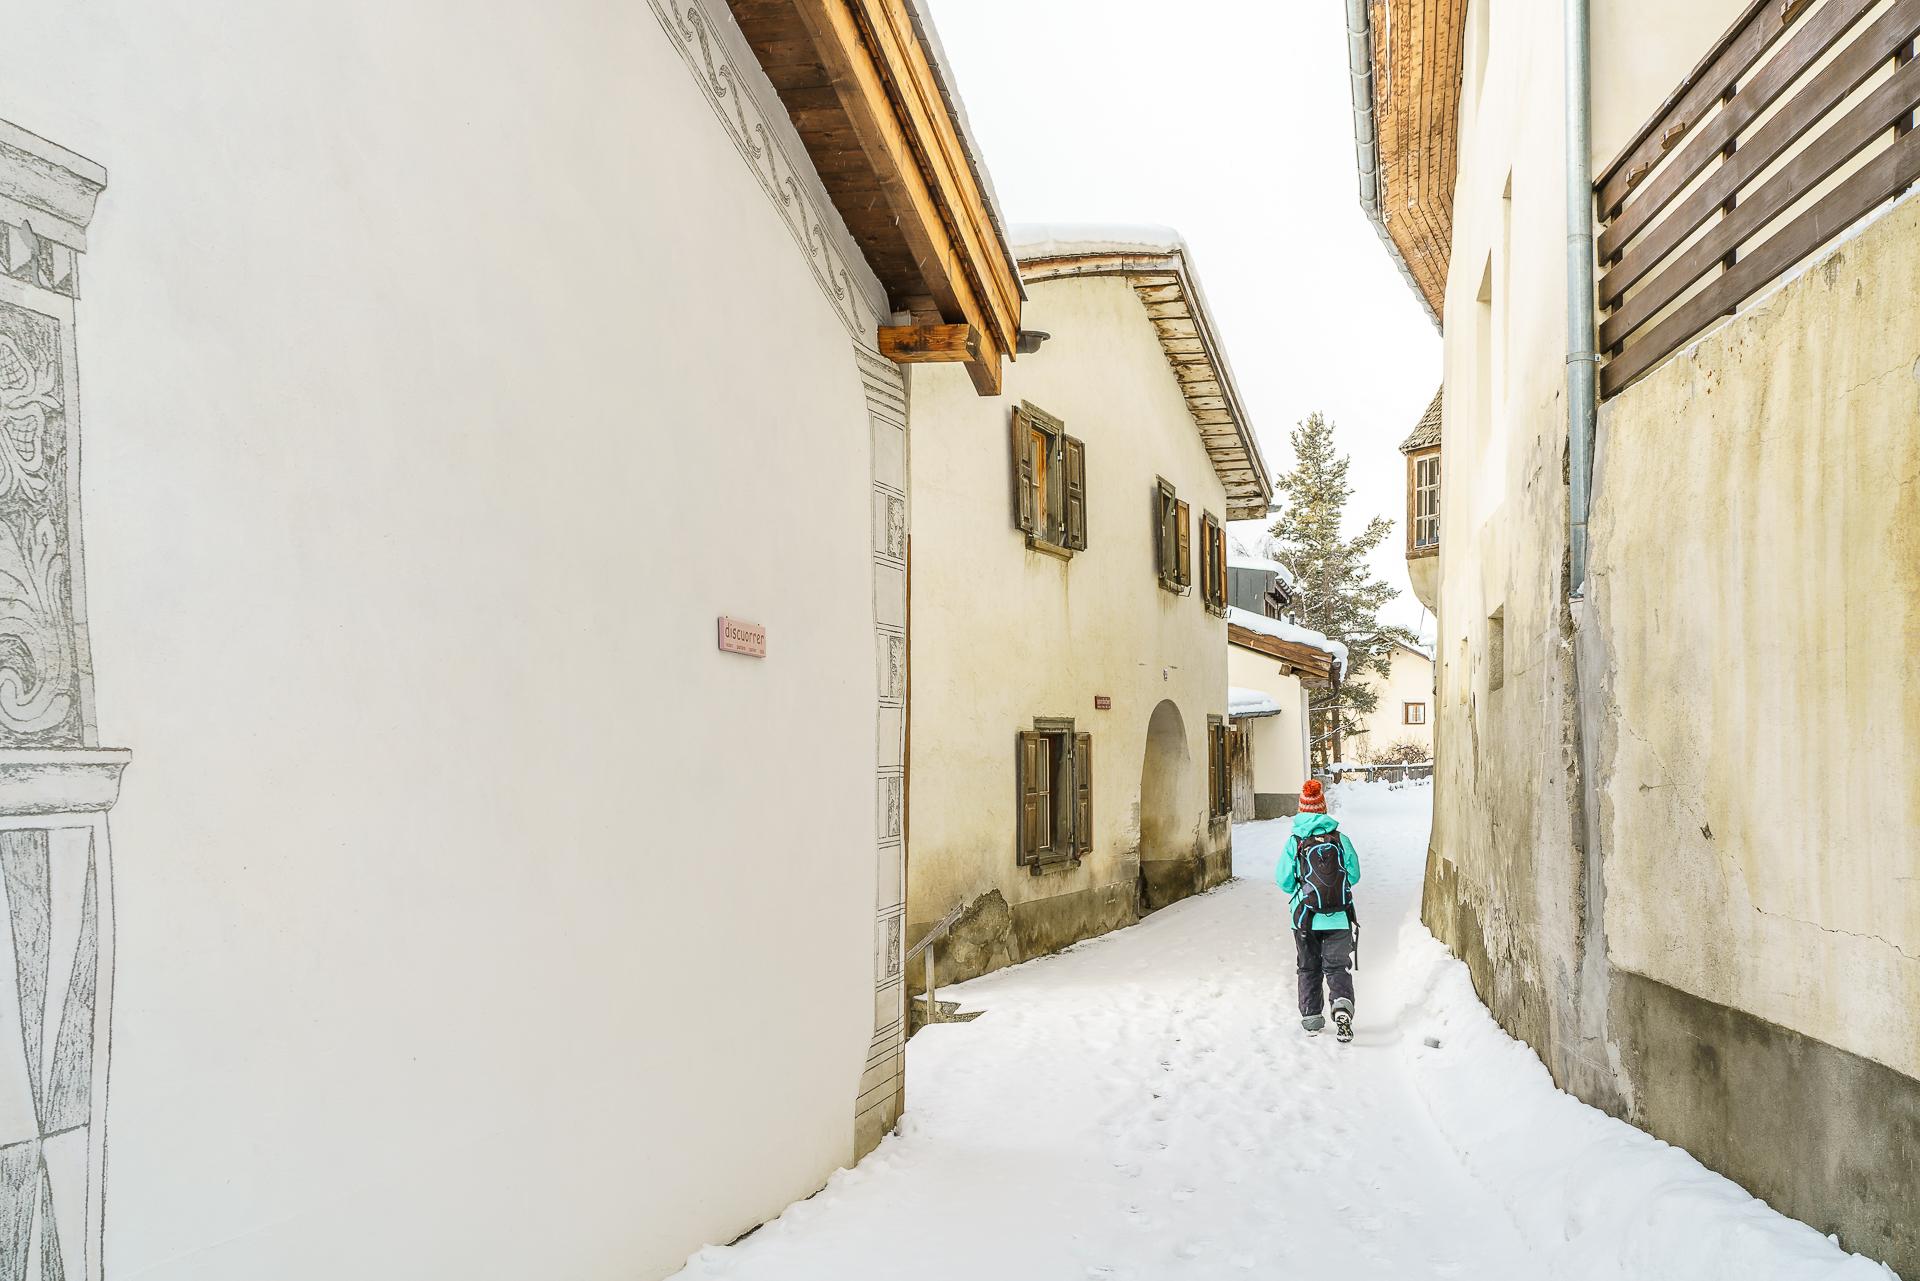 Vna-Unterengadin-Dorf